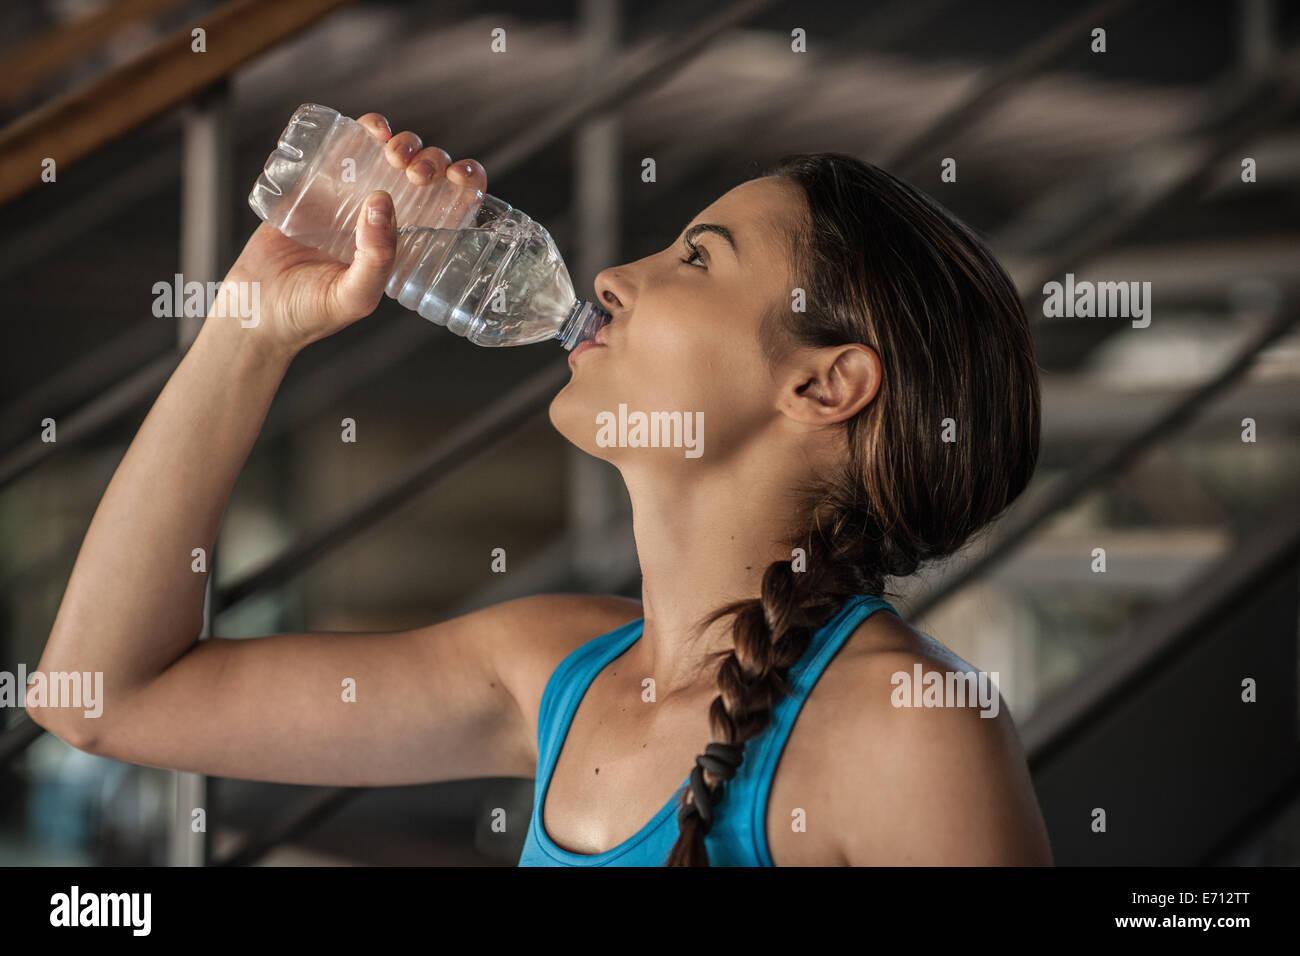 Mujer joven de beber agua de botella Imagen De Stock